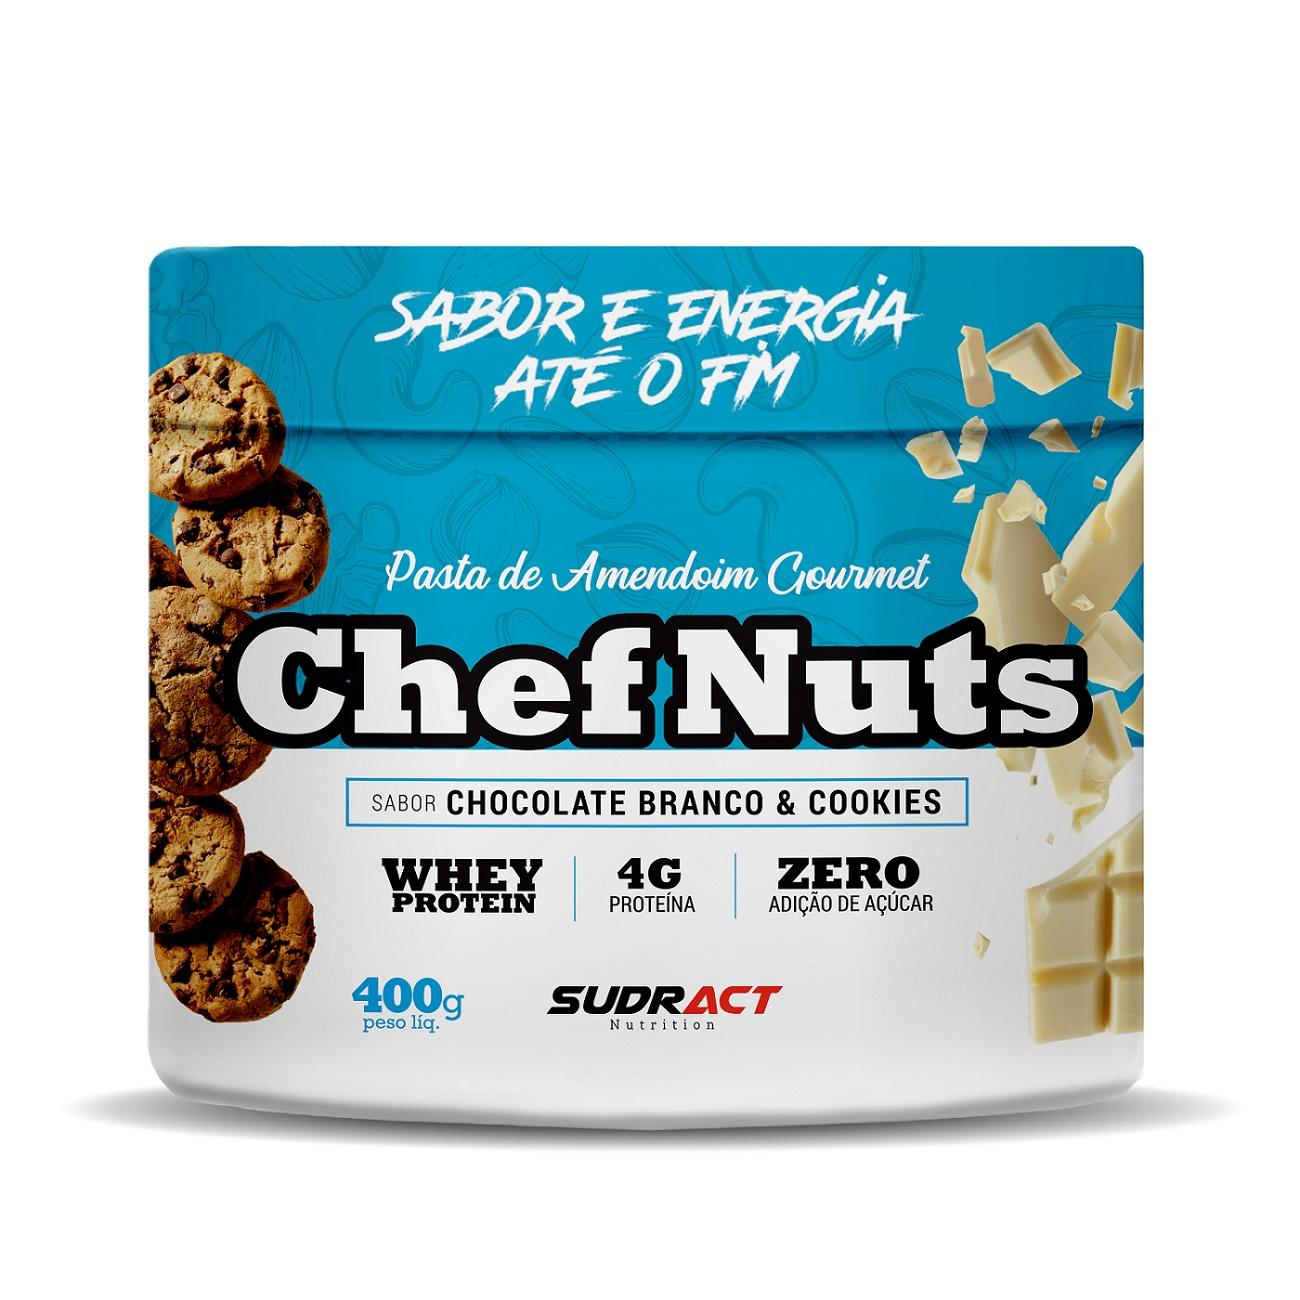 Pasta de Amendoim Gourmet Chef Nuts Chocolate Branco com Cookies com Whey Protein - Zero Açúcar - Sudract Nutrition